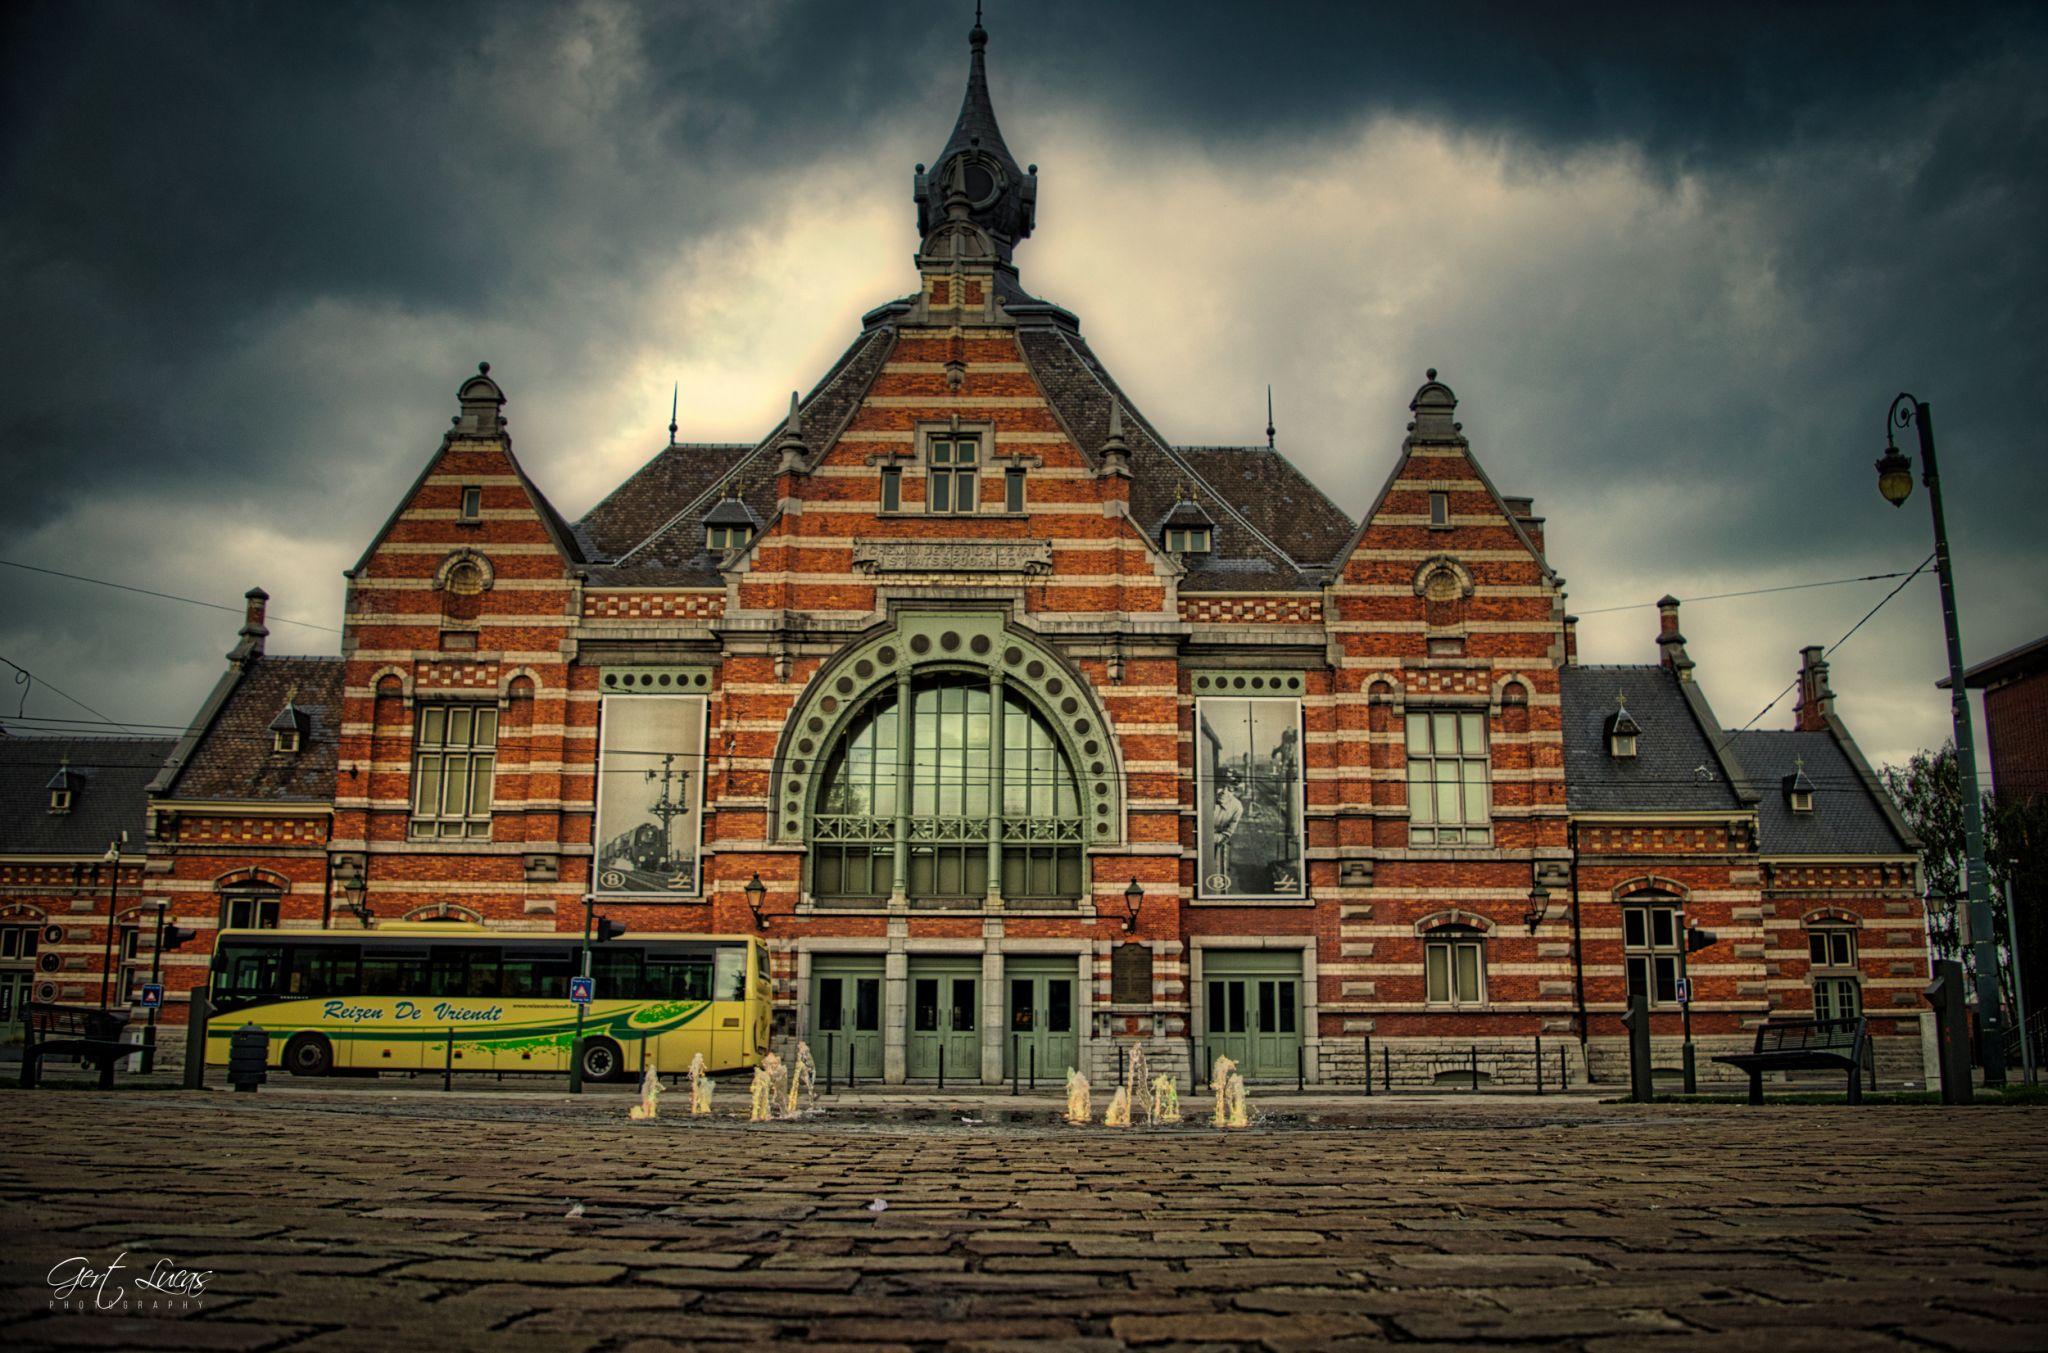 Trainworld - old station, Belgium